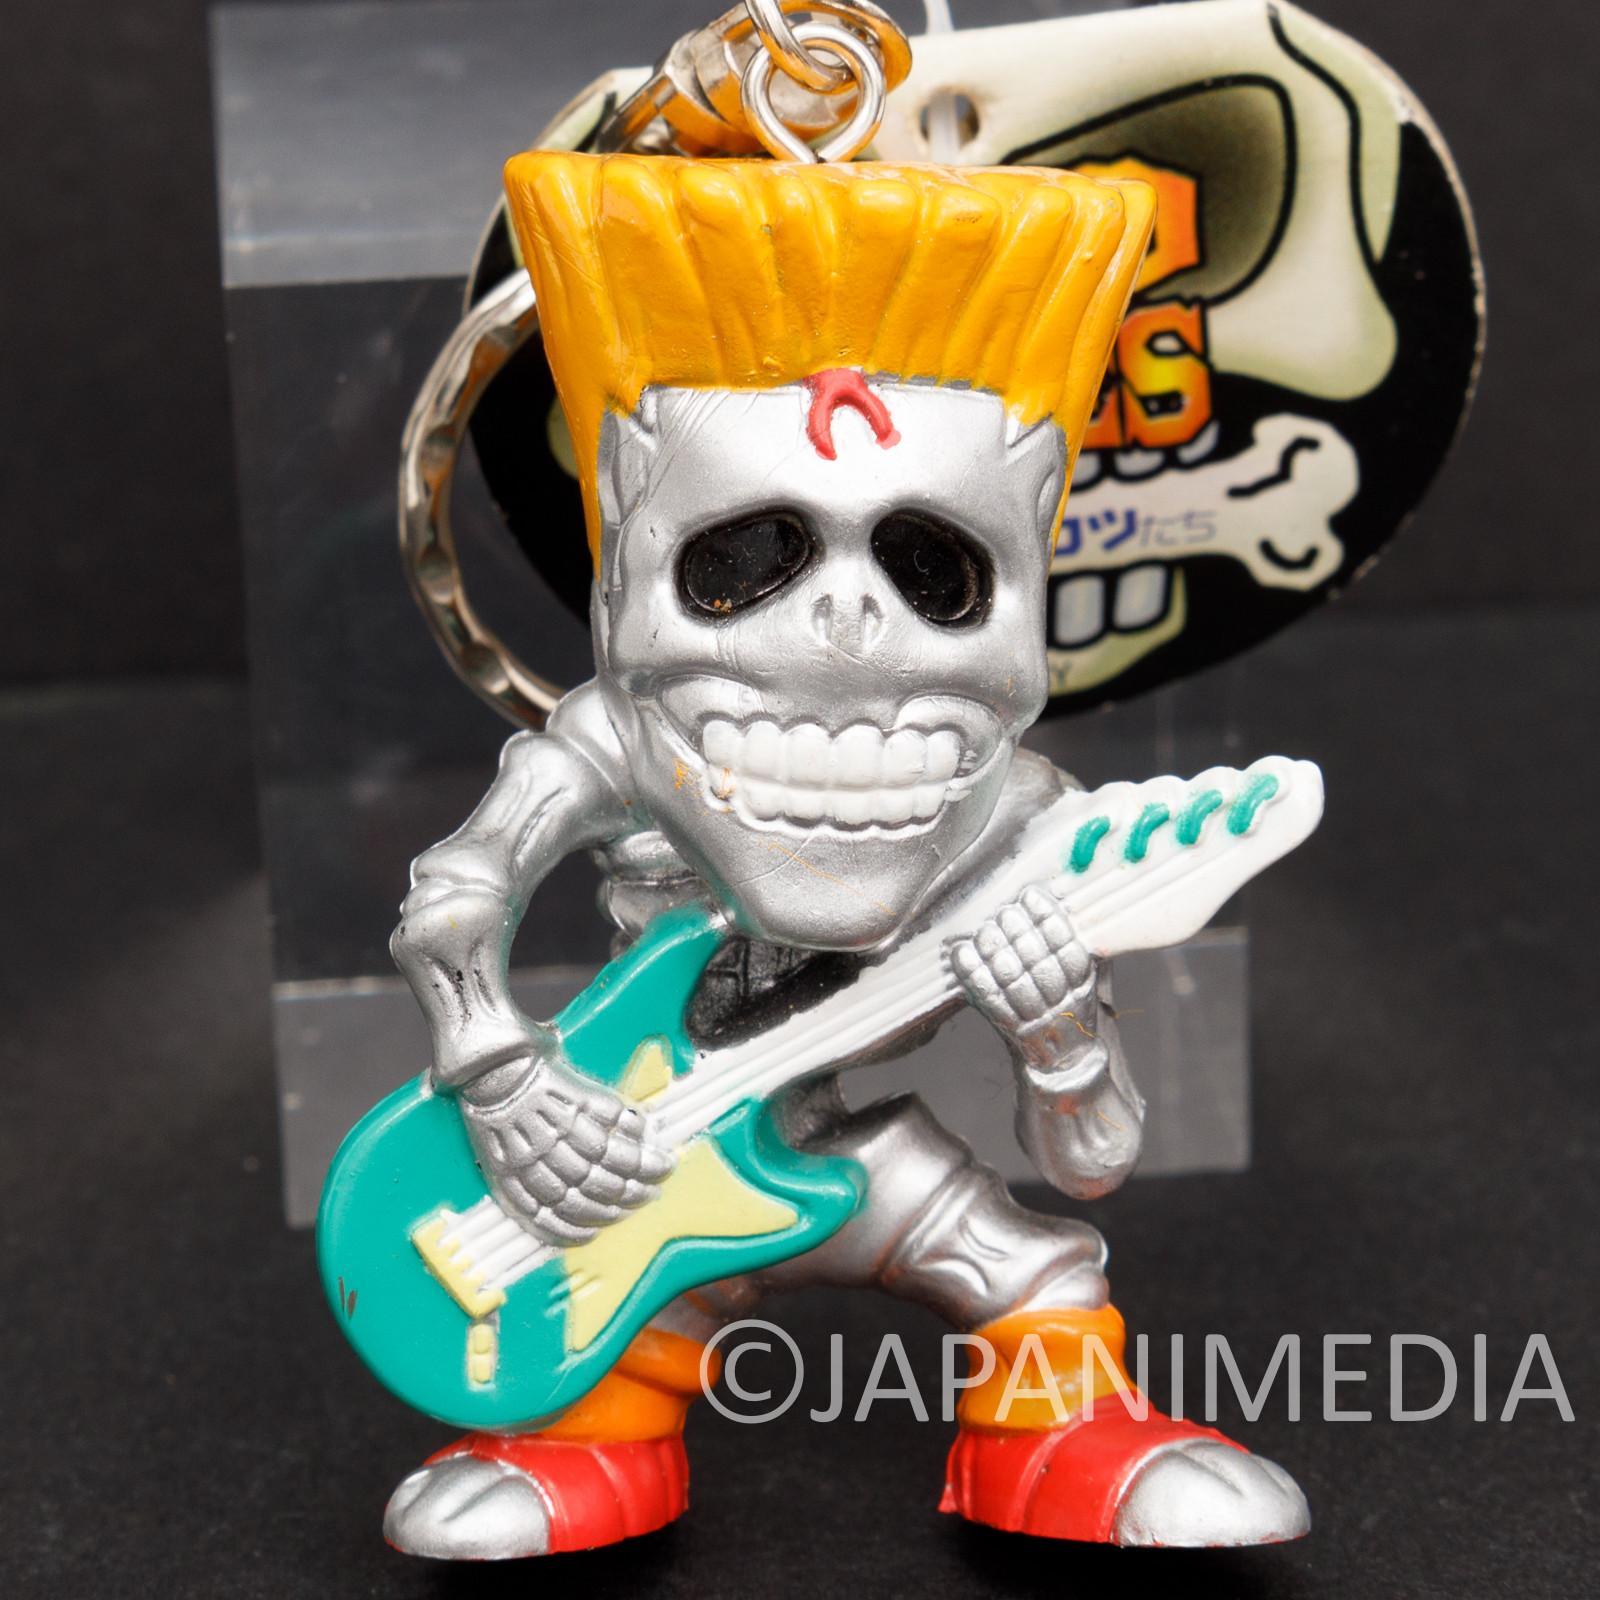 BAD BONES Heavy Metal Figure Keychain Hobby Mate JAPAN